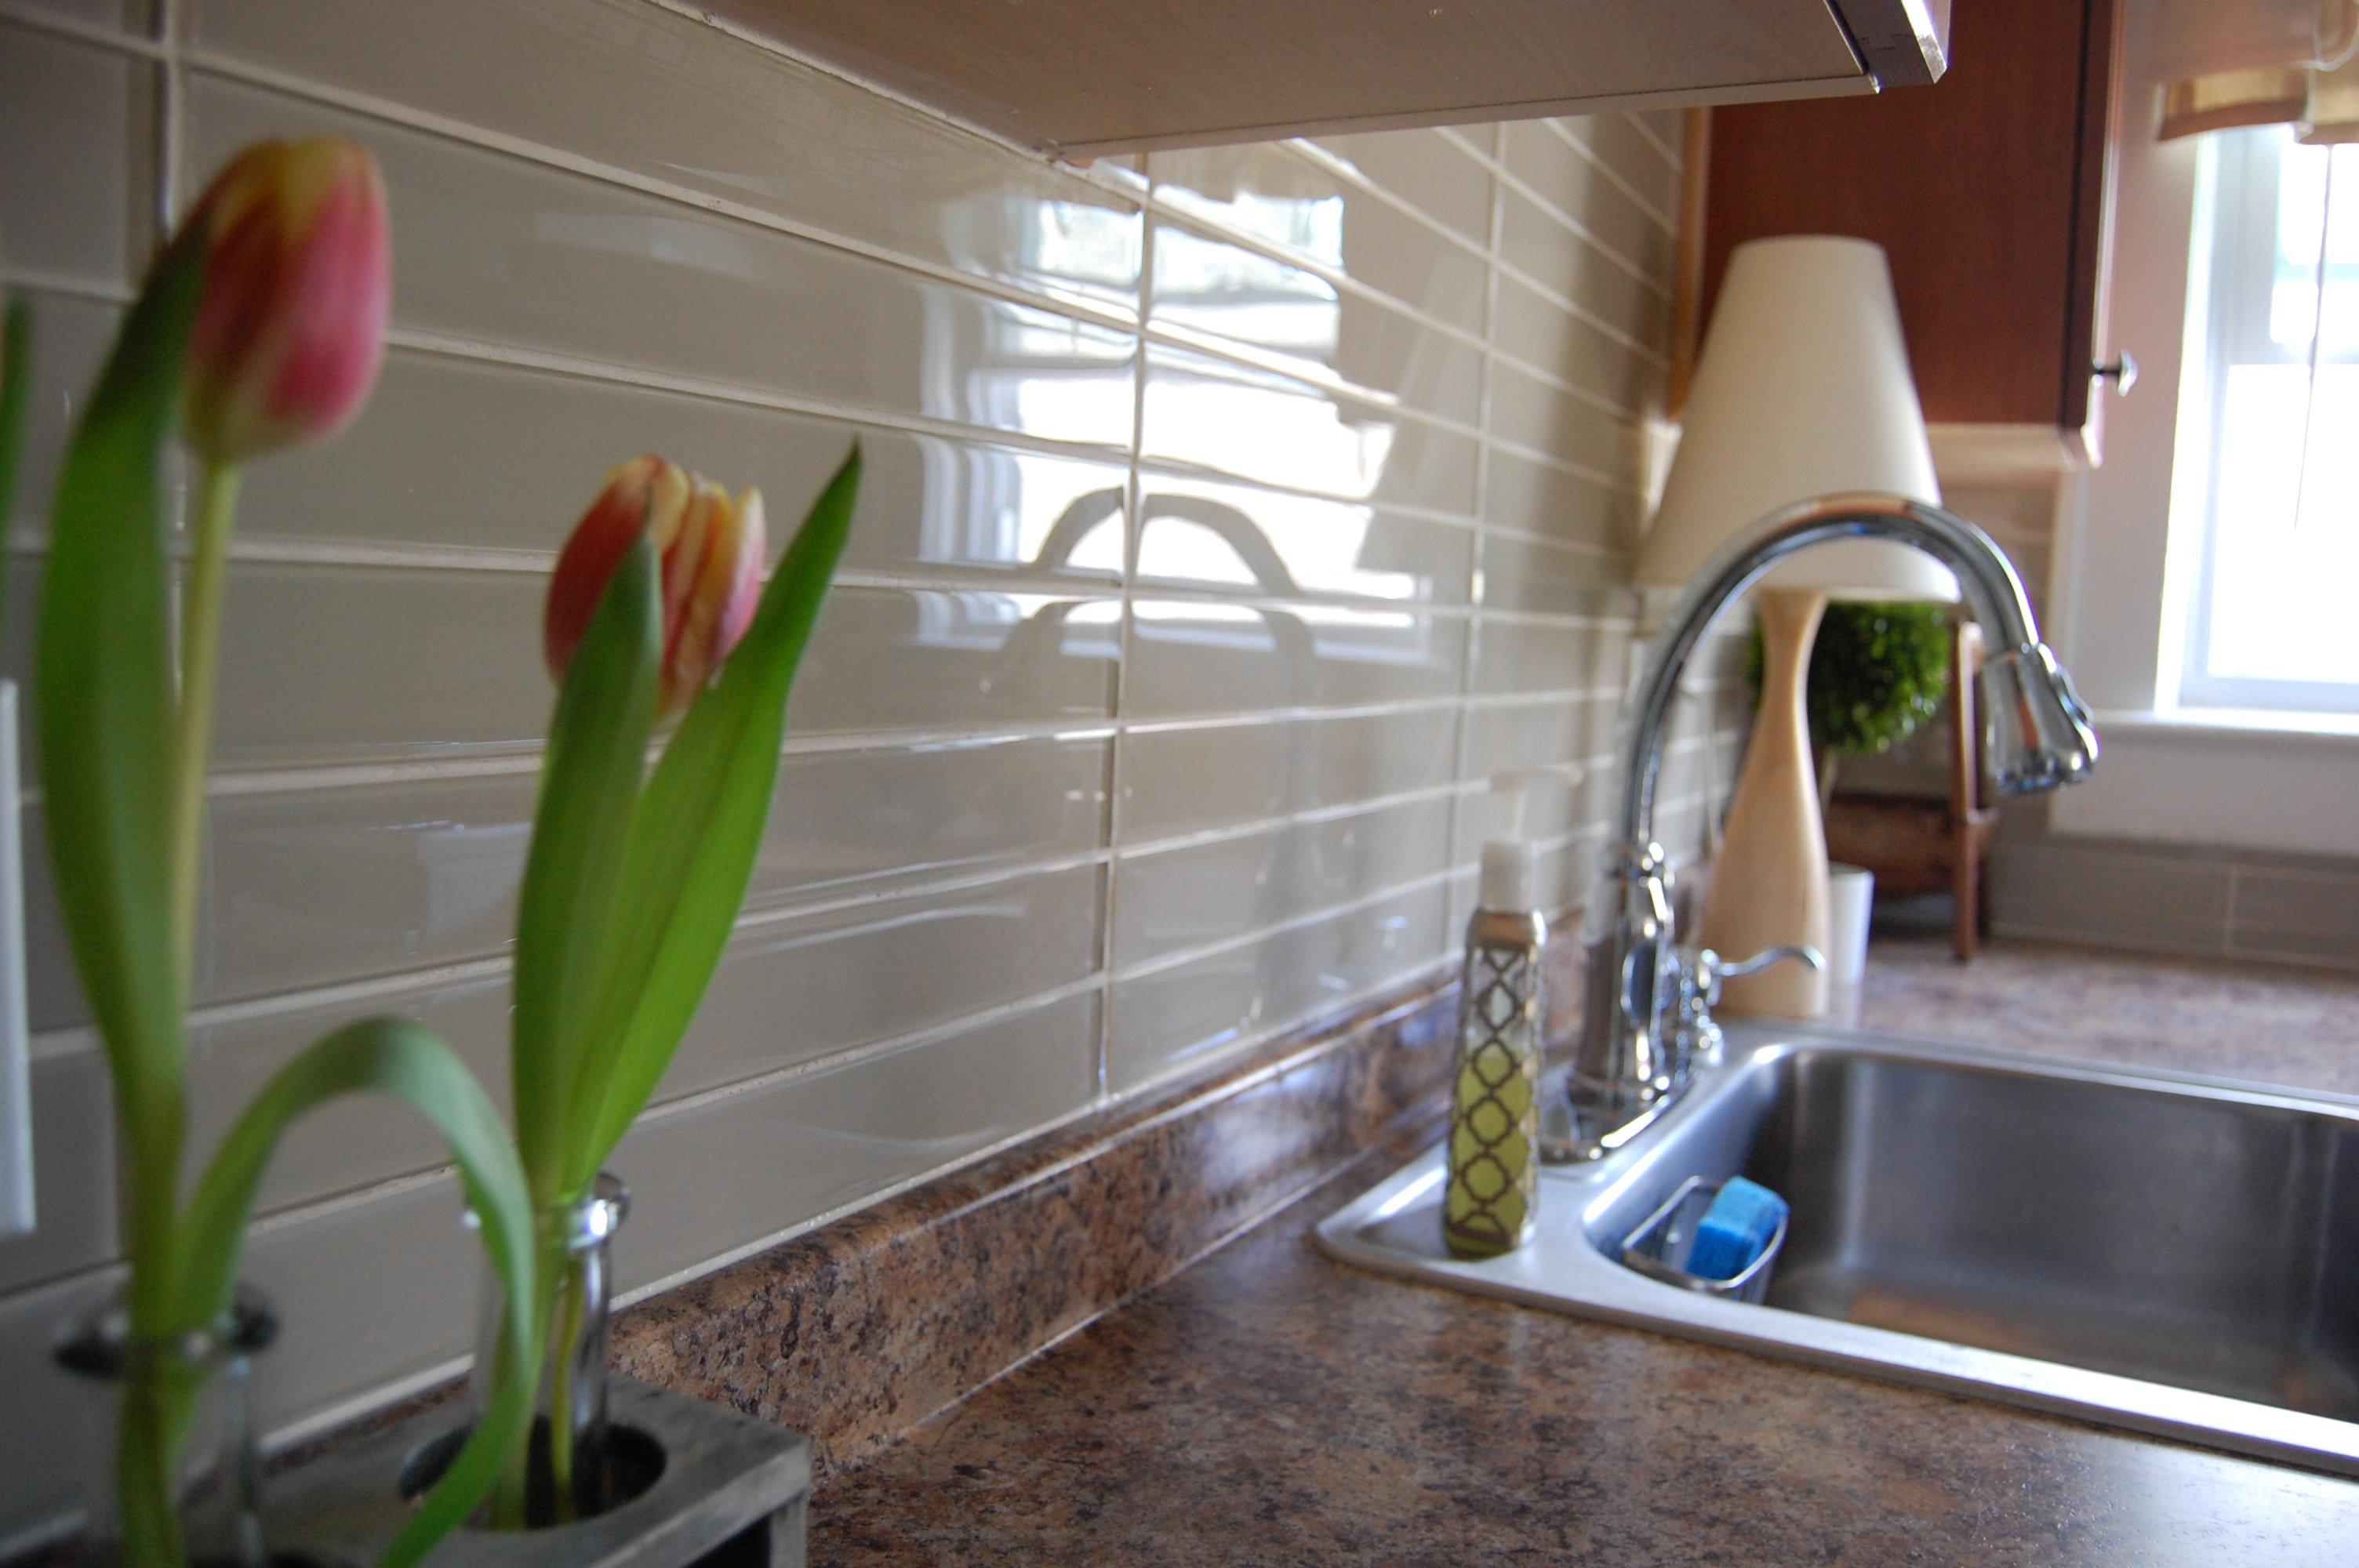 White Kitchen Backsplashes The Drama Of The Kitchen Backsplash Made2style